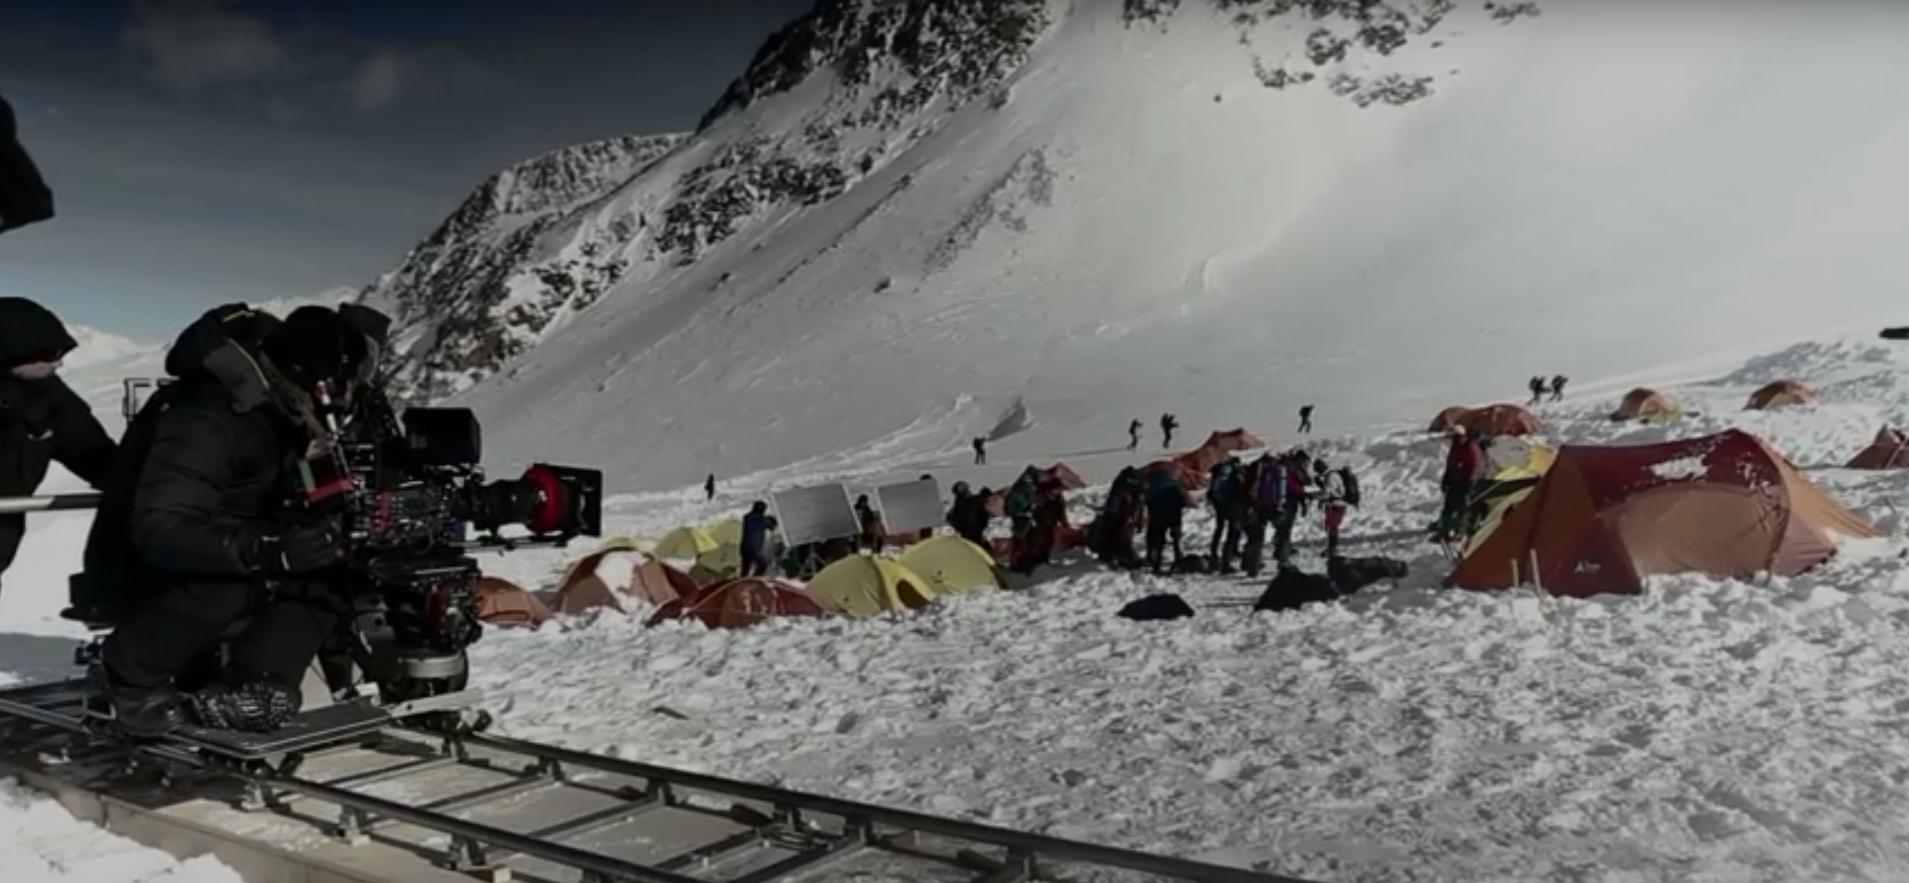 Behind-the-scene on the set of  Everest  - screenshot via  YouTube .